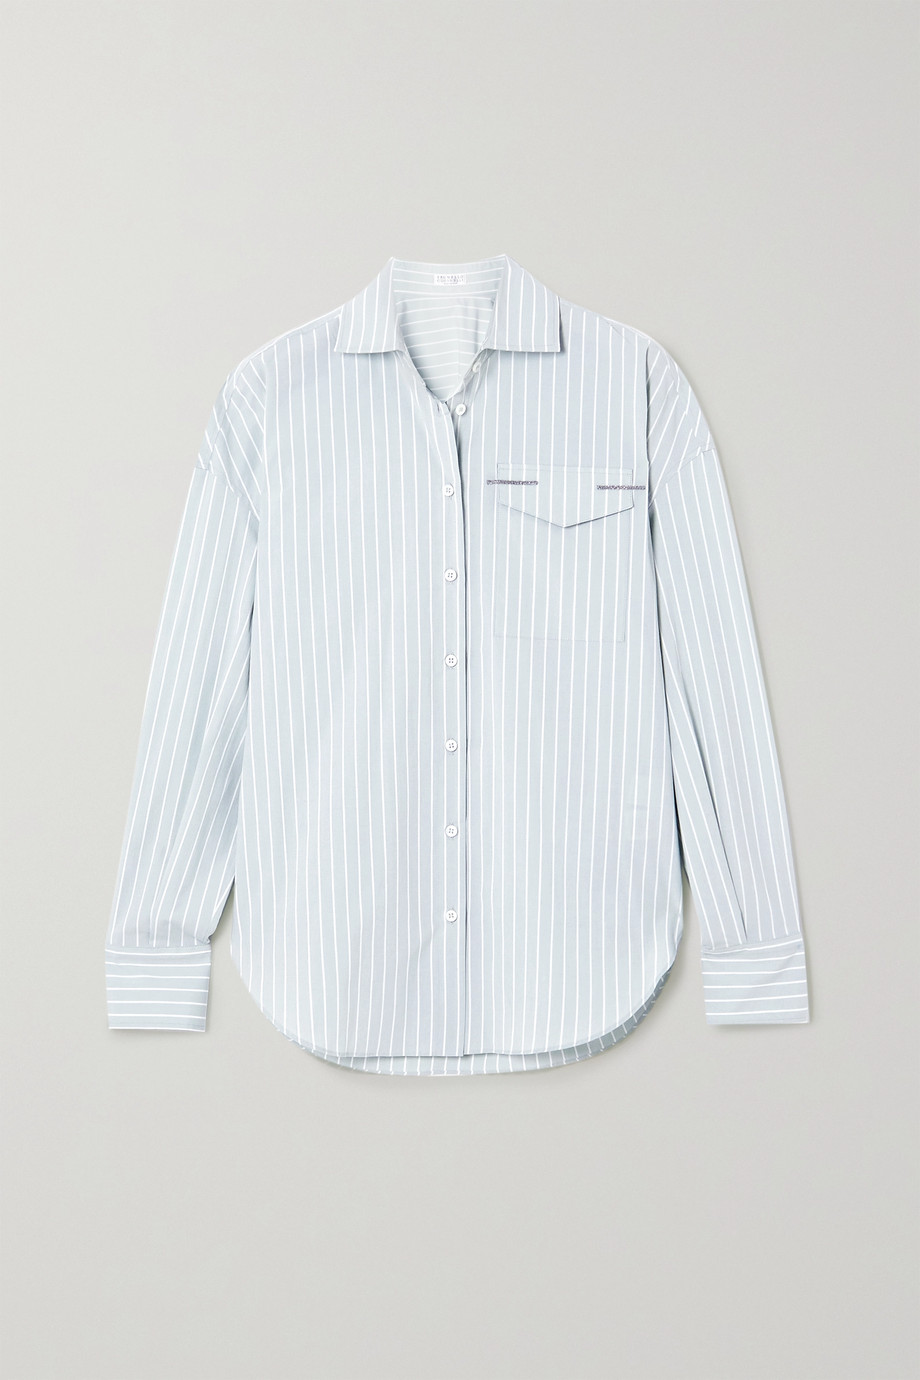 Brunello Cucinelli Bead-embellished striped cotton-blend Oxford shirt